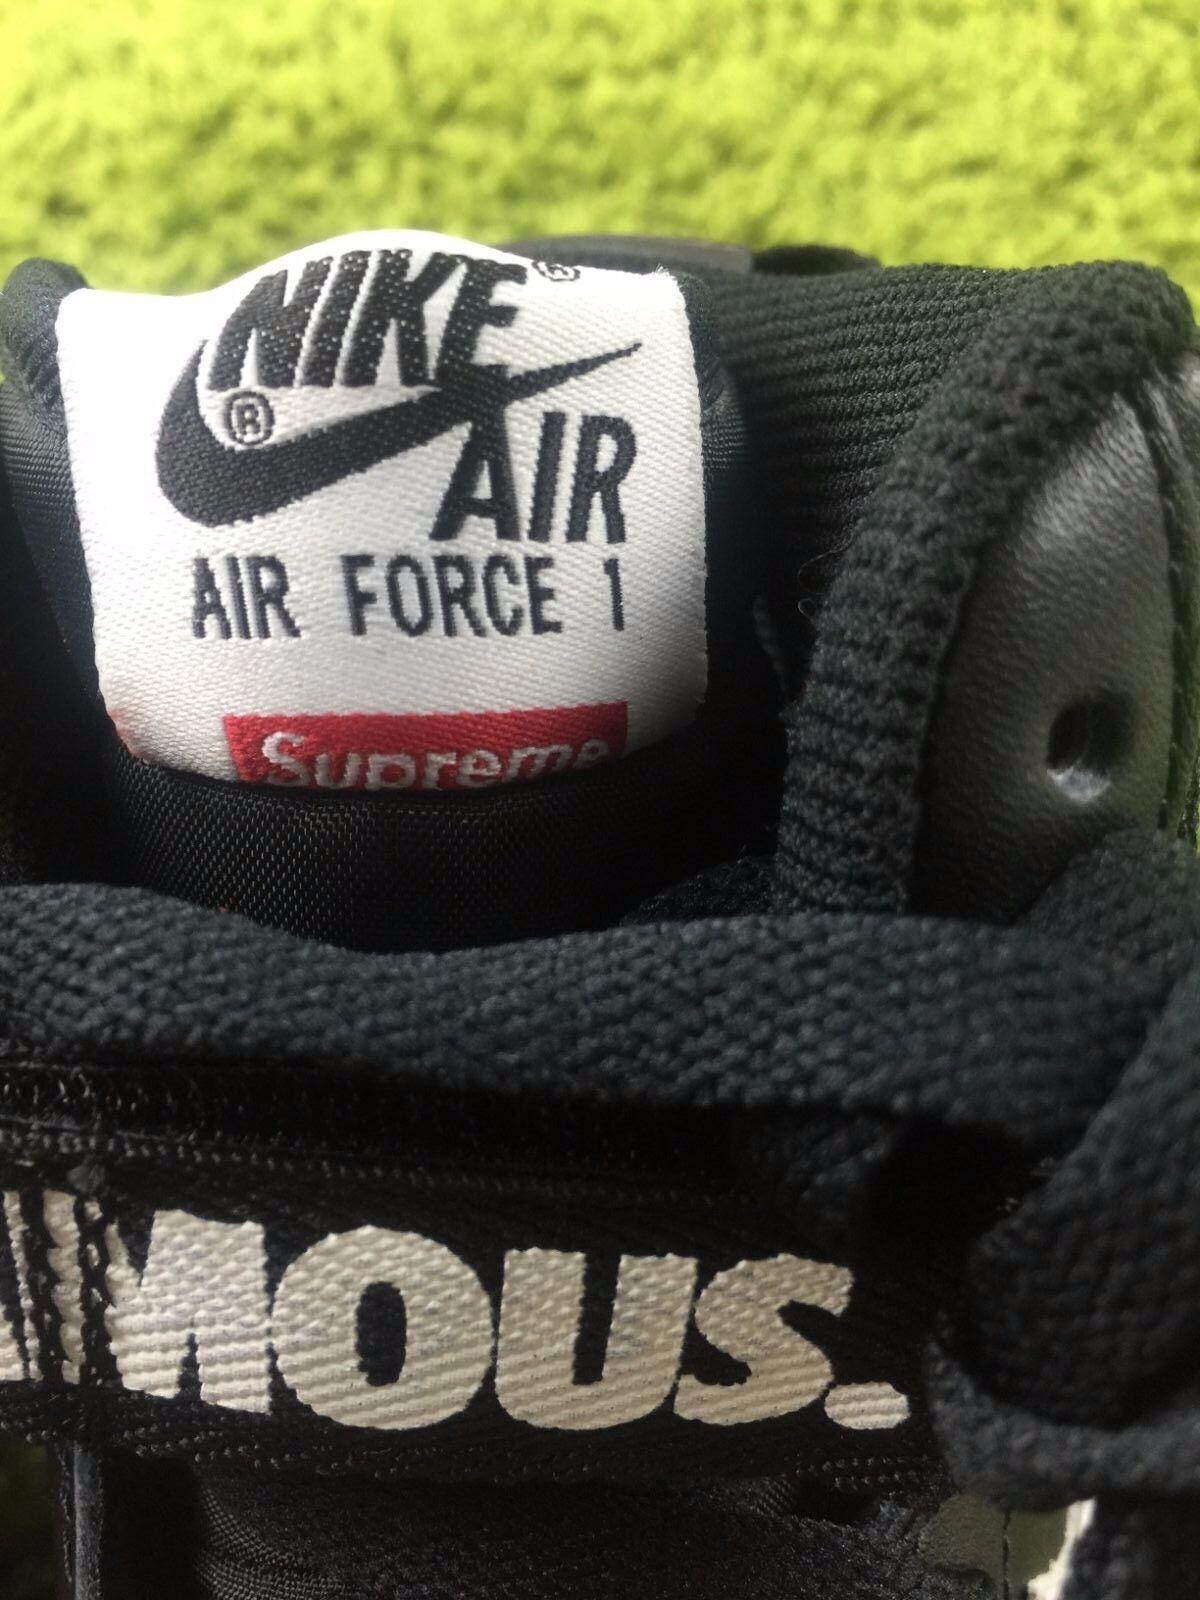 reputable site 38941 89282 Supreme F W 2014 Nike Air Force 1 High SP Black White (698696-